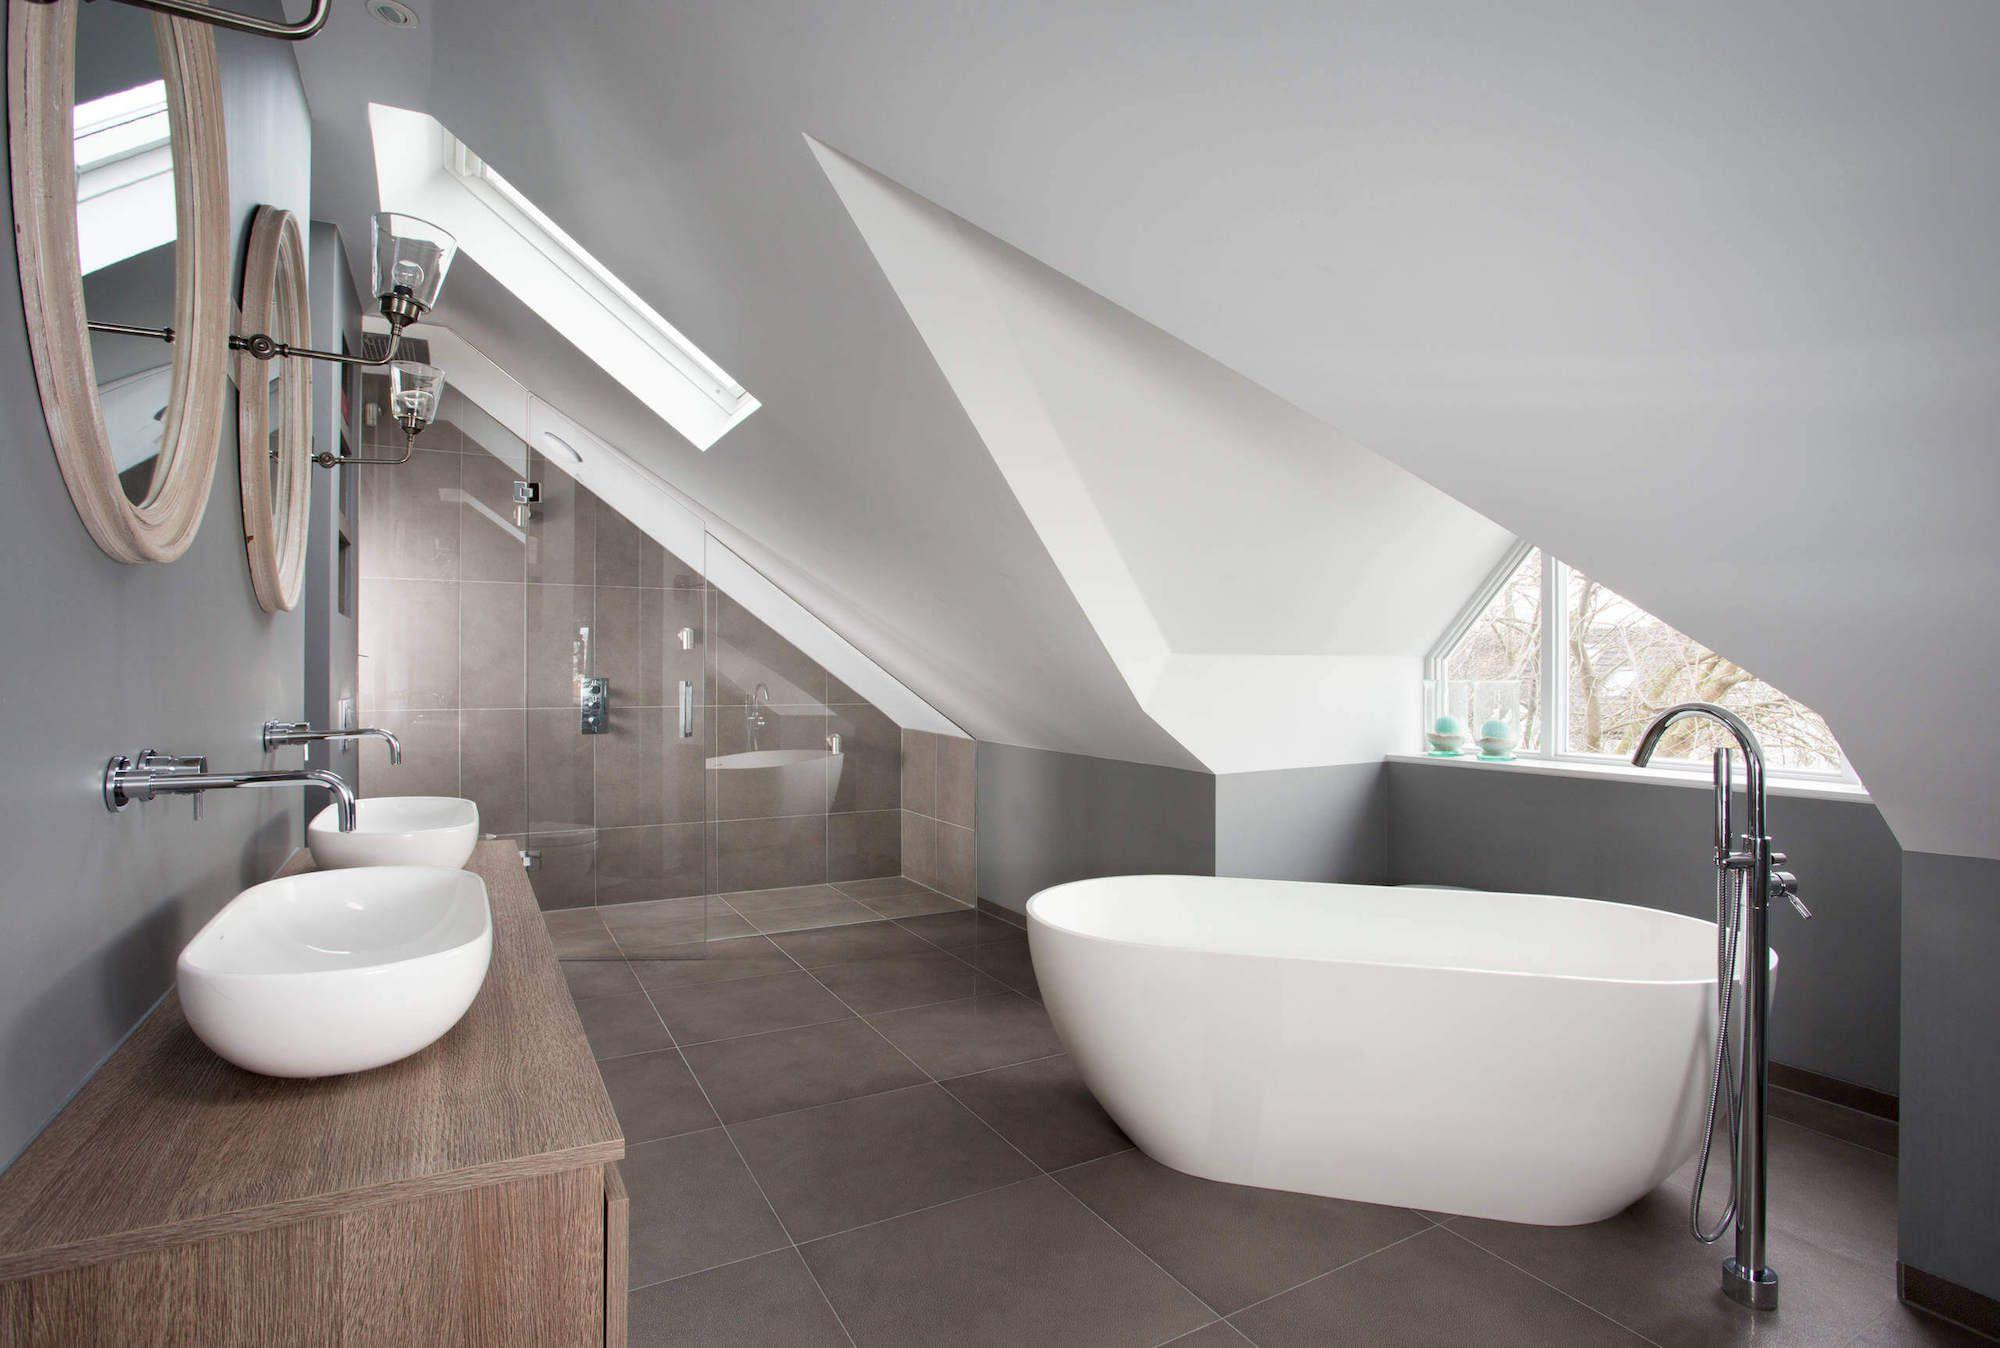 west-london-home-frenchstef-interior-design-05